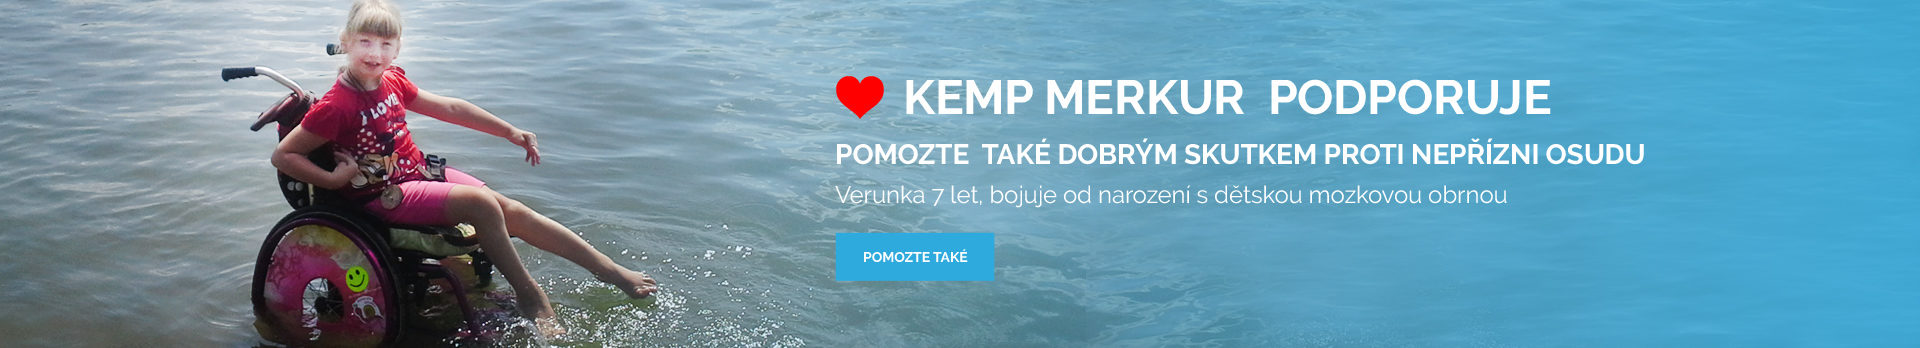 Banner Kemp Merkur podporuje